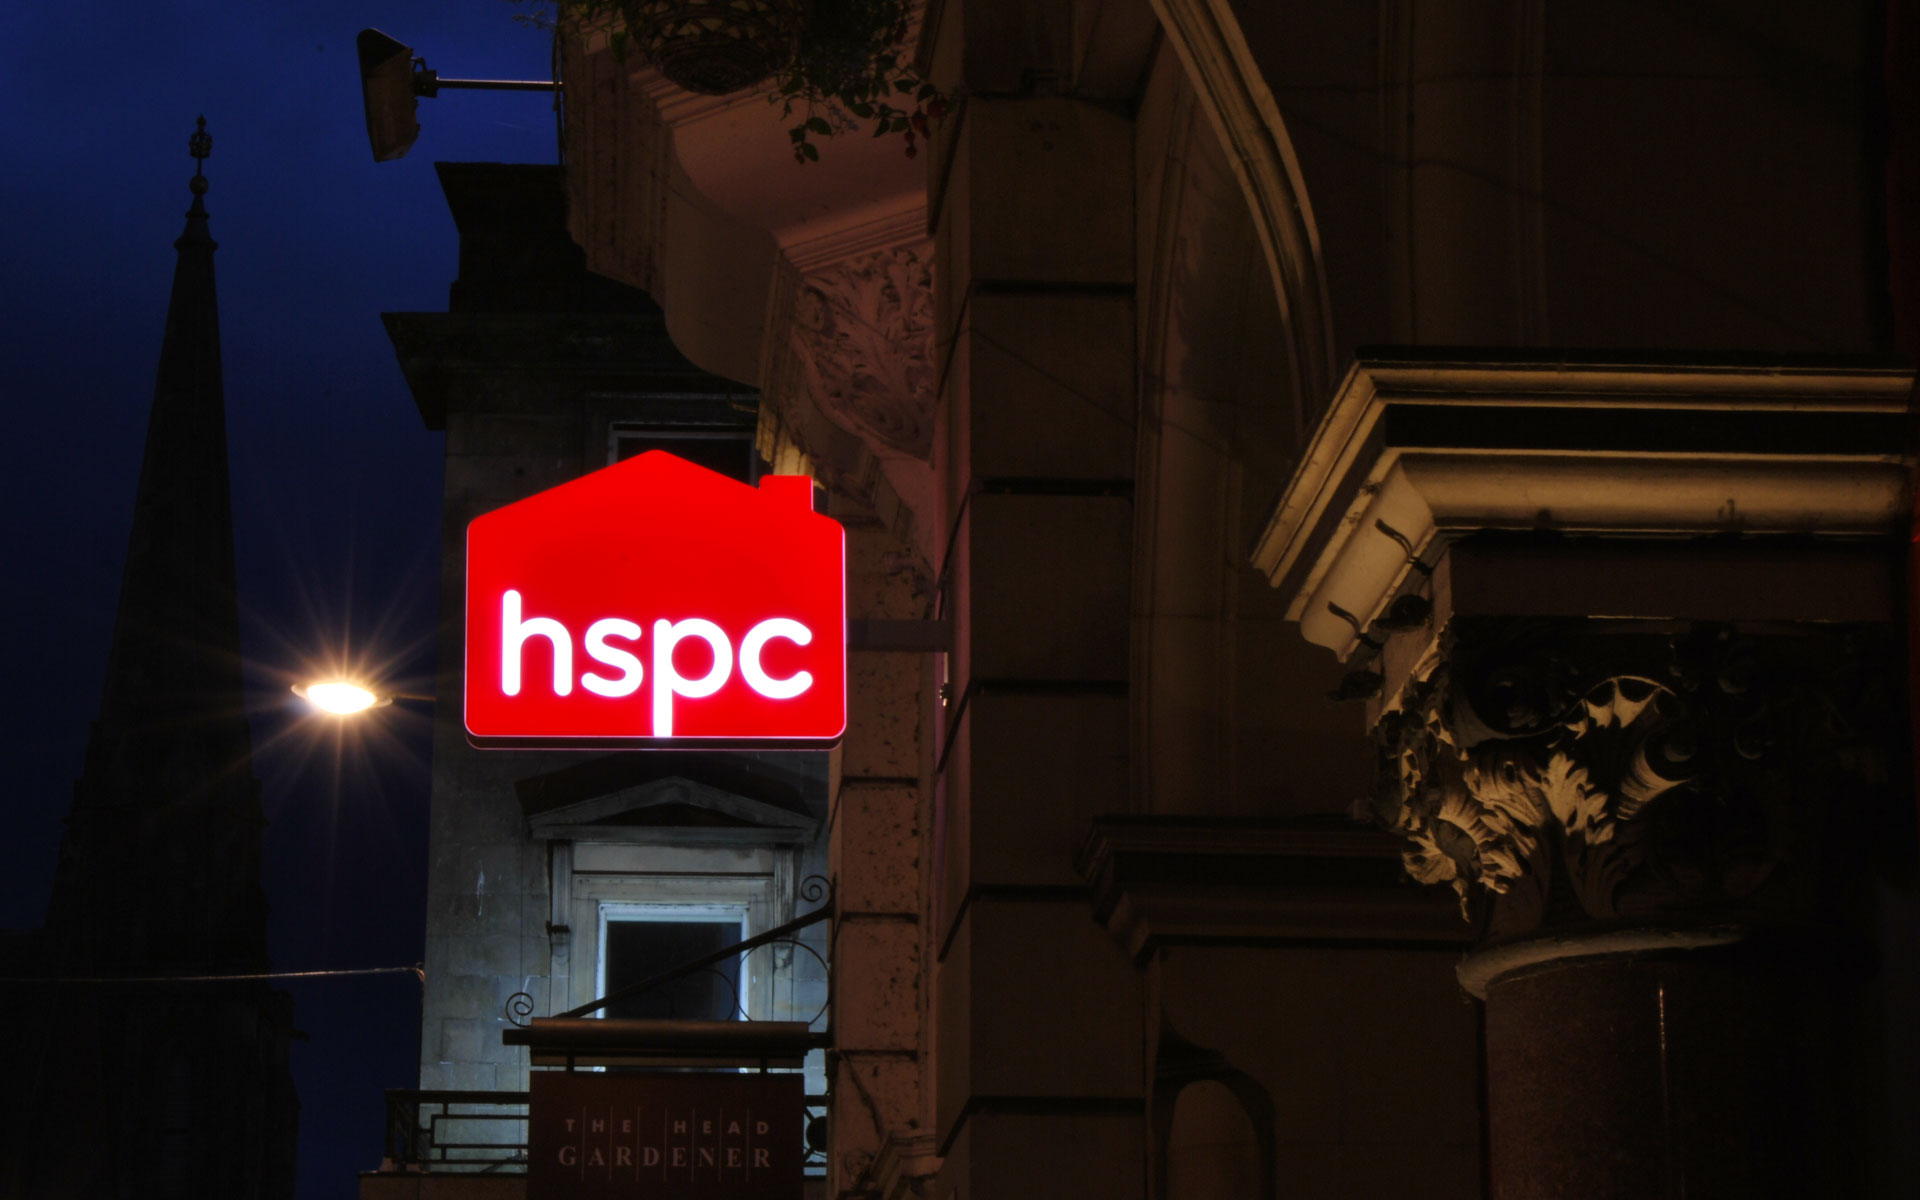 hspc sign lit up